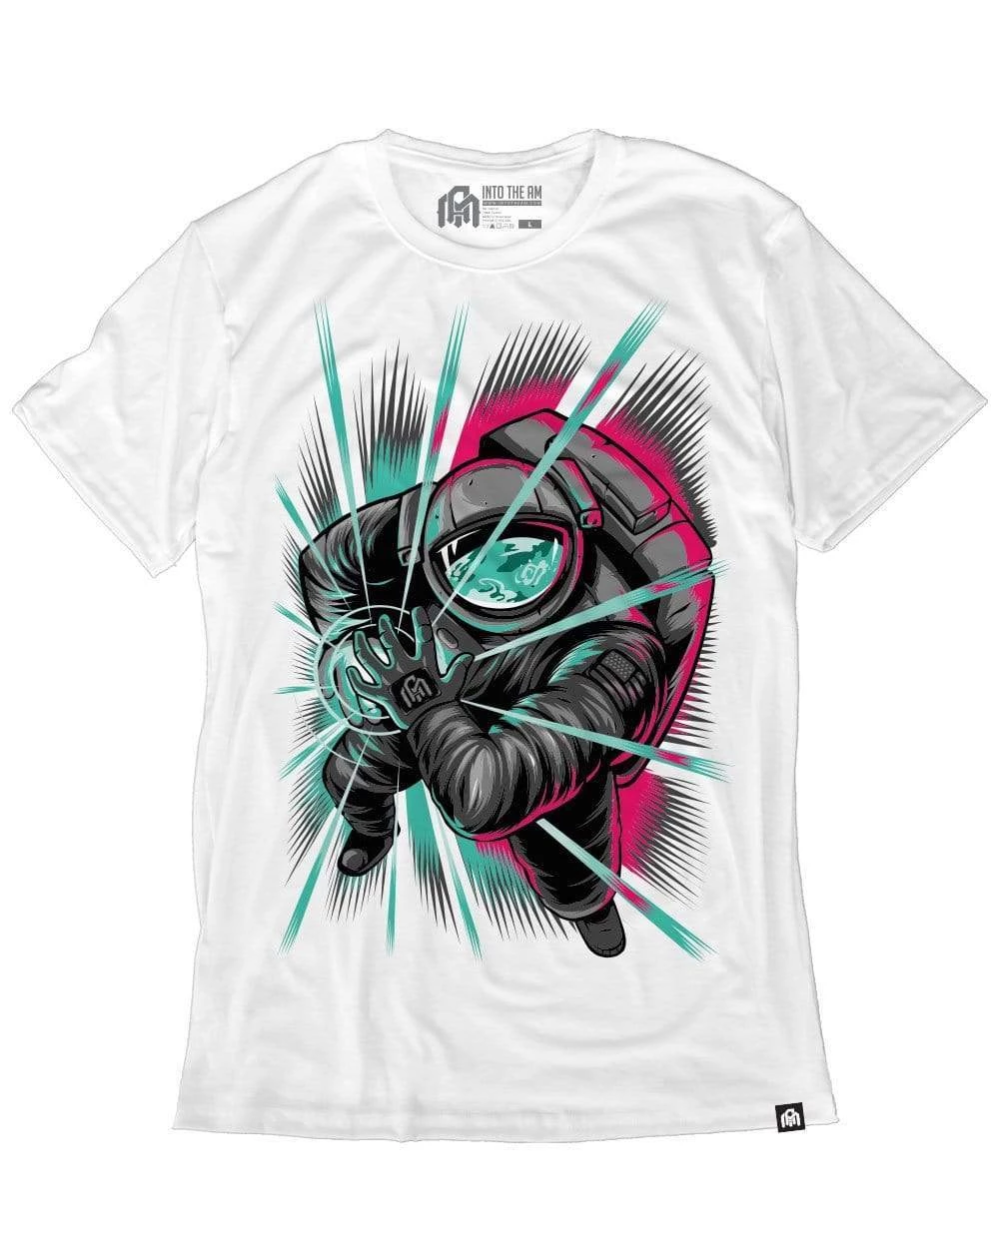 Last Resort Tee Mens Tees Graphic Tee Shirts Men S Graphic T Shirt [ 1248 x 1000 Pixel ]